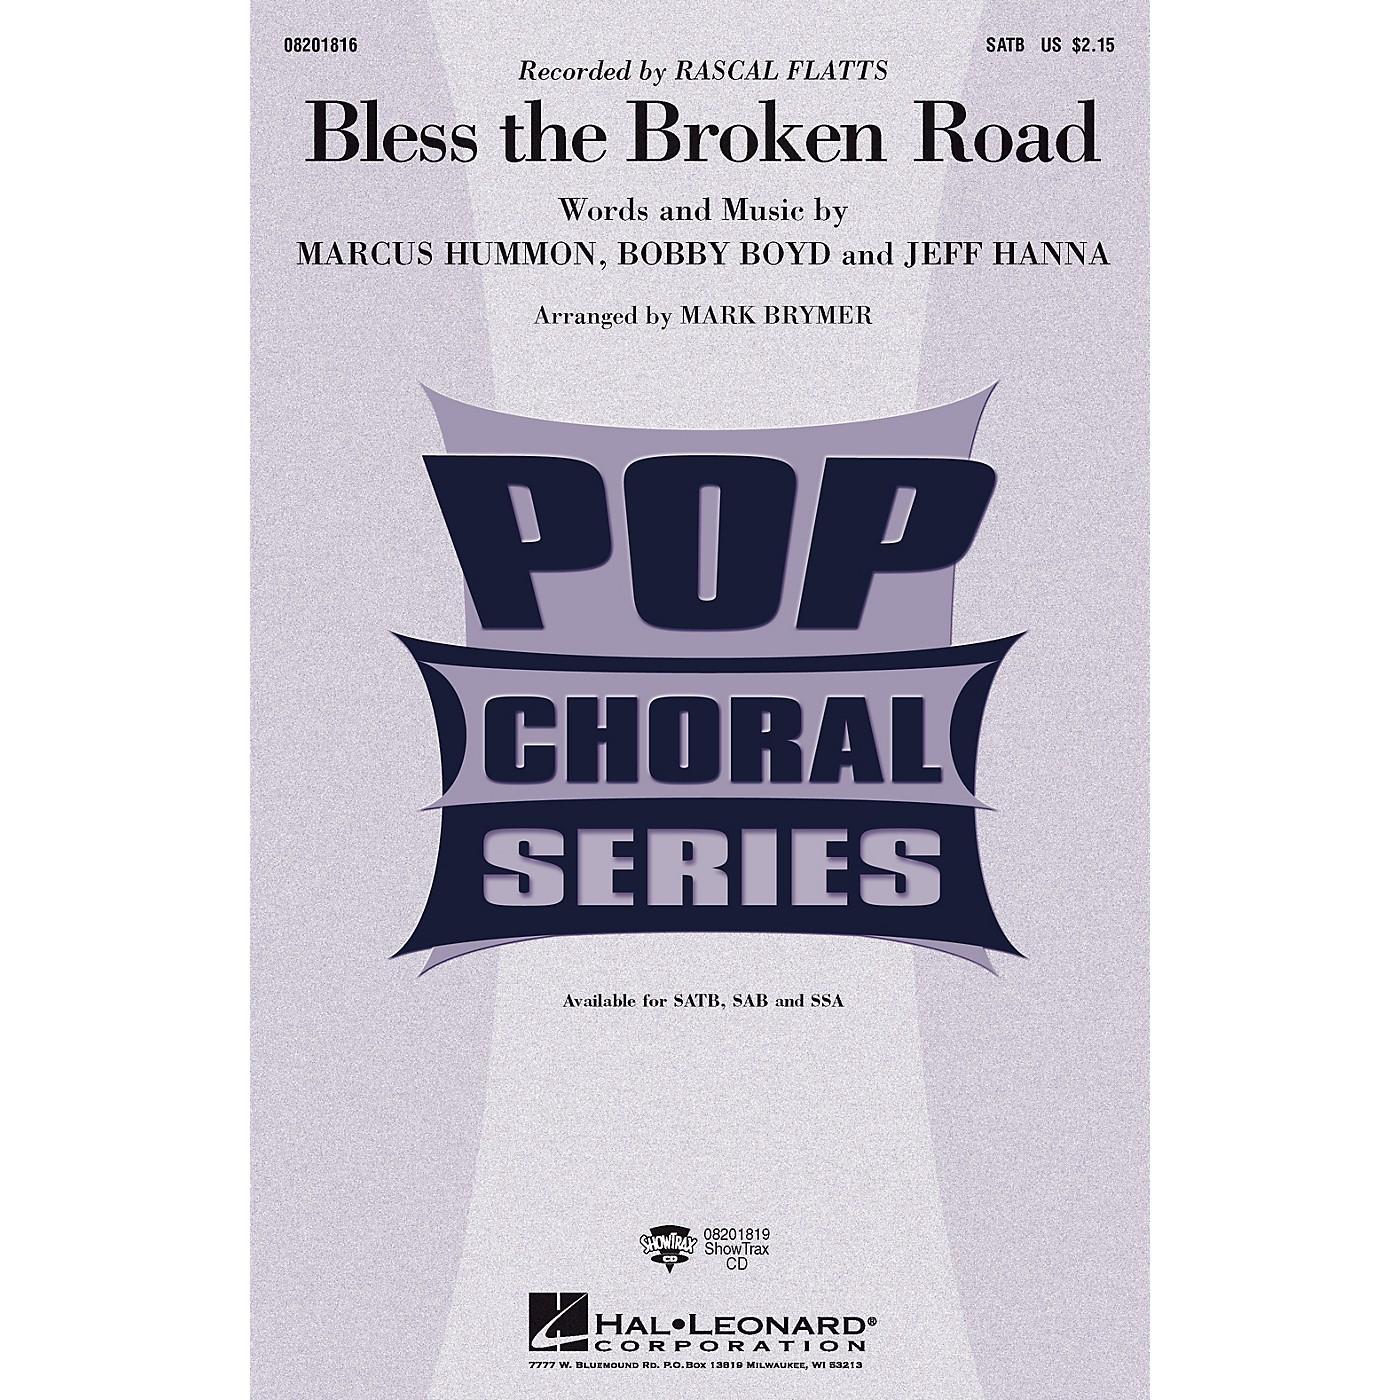 Hal Leonard Bless the Broken Road SAB by Rascal Flatts Arranged by Mark Brymer thumbnail